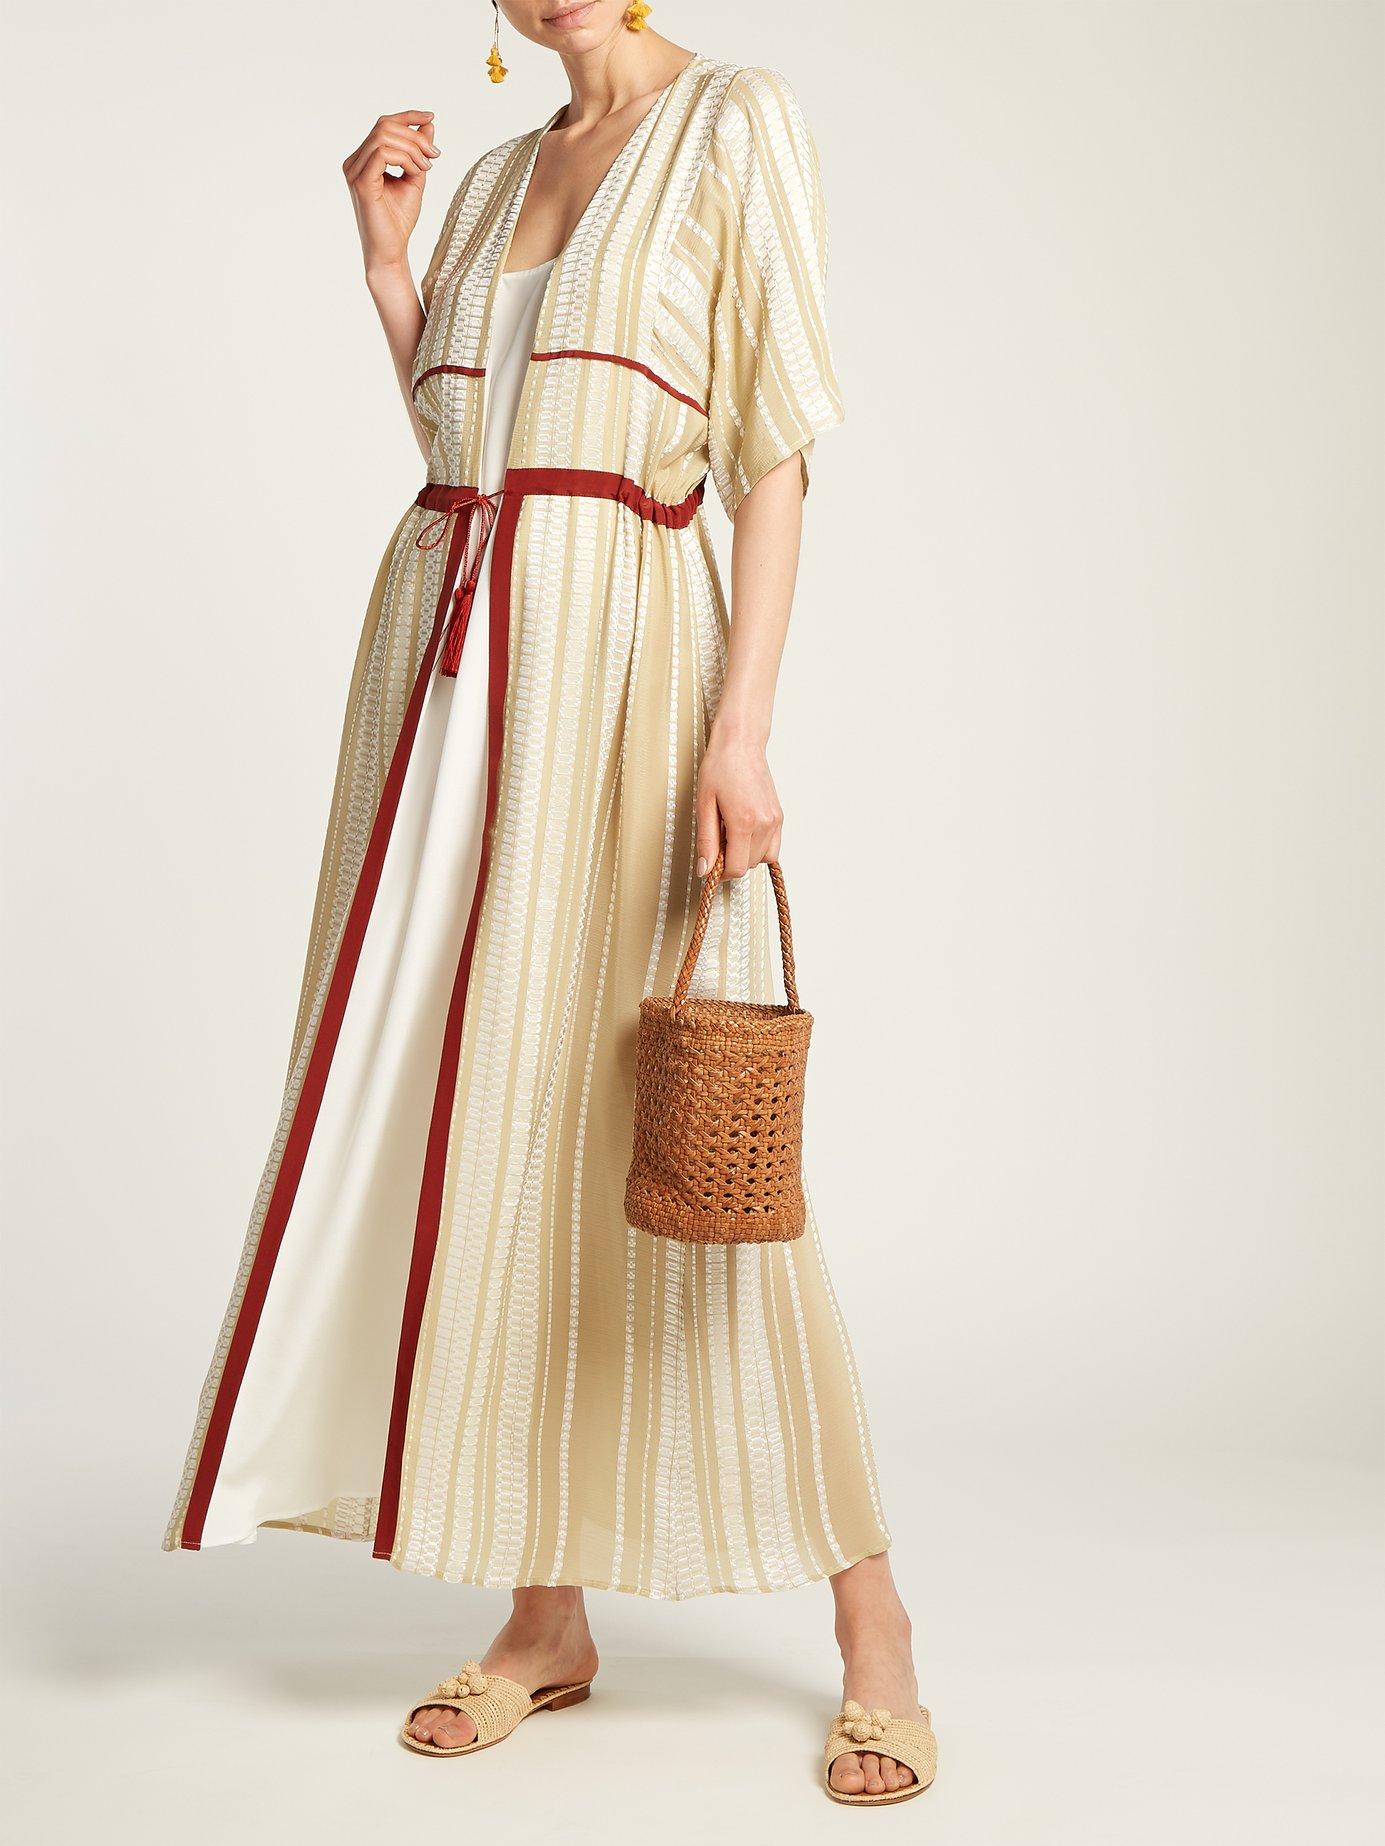 Chora striped silk-blend dress by Zeus + Dione